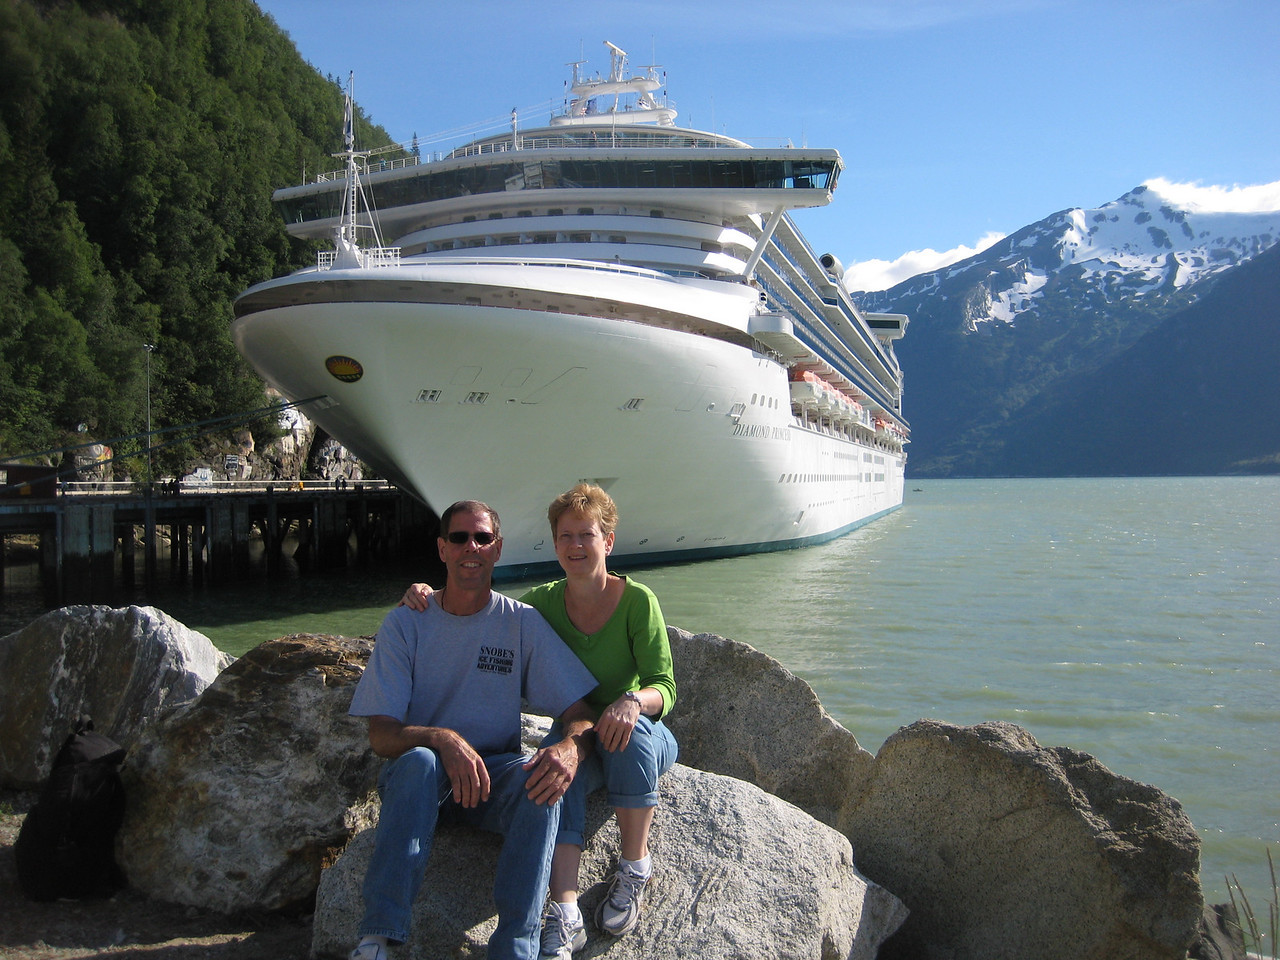 Tom and wife Barb - Alaska, July 2010